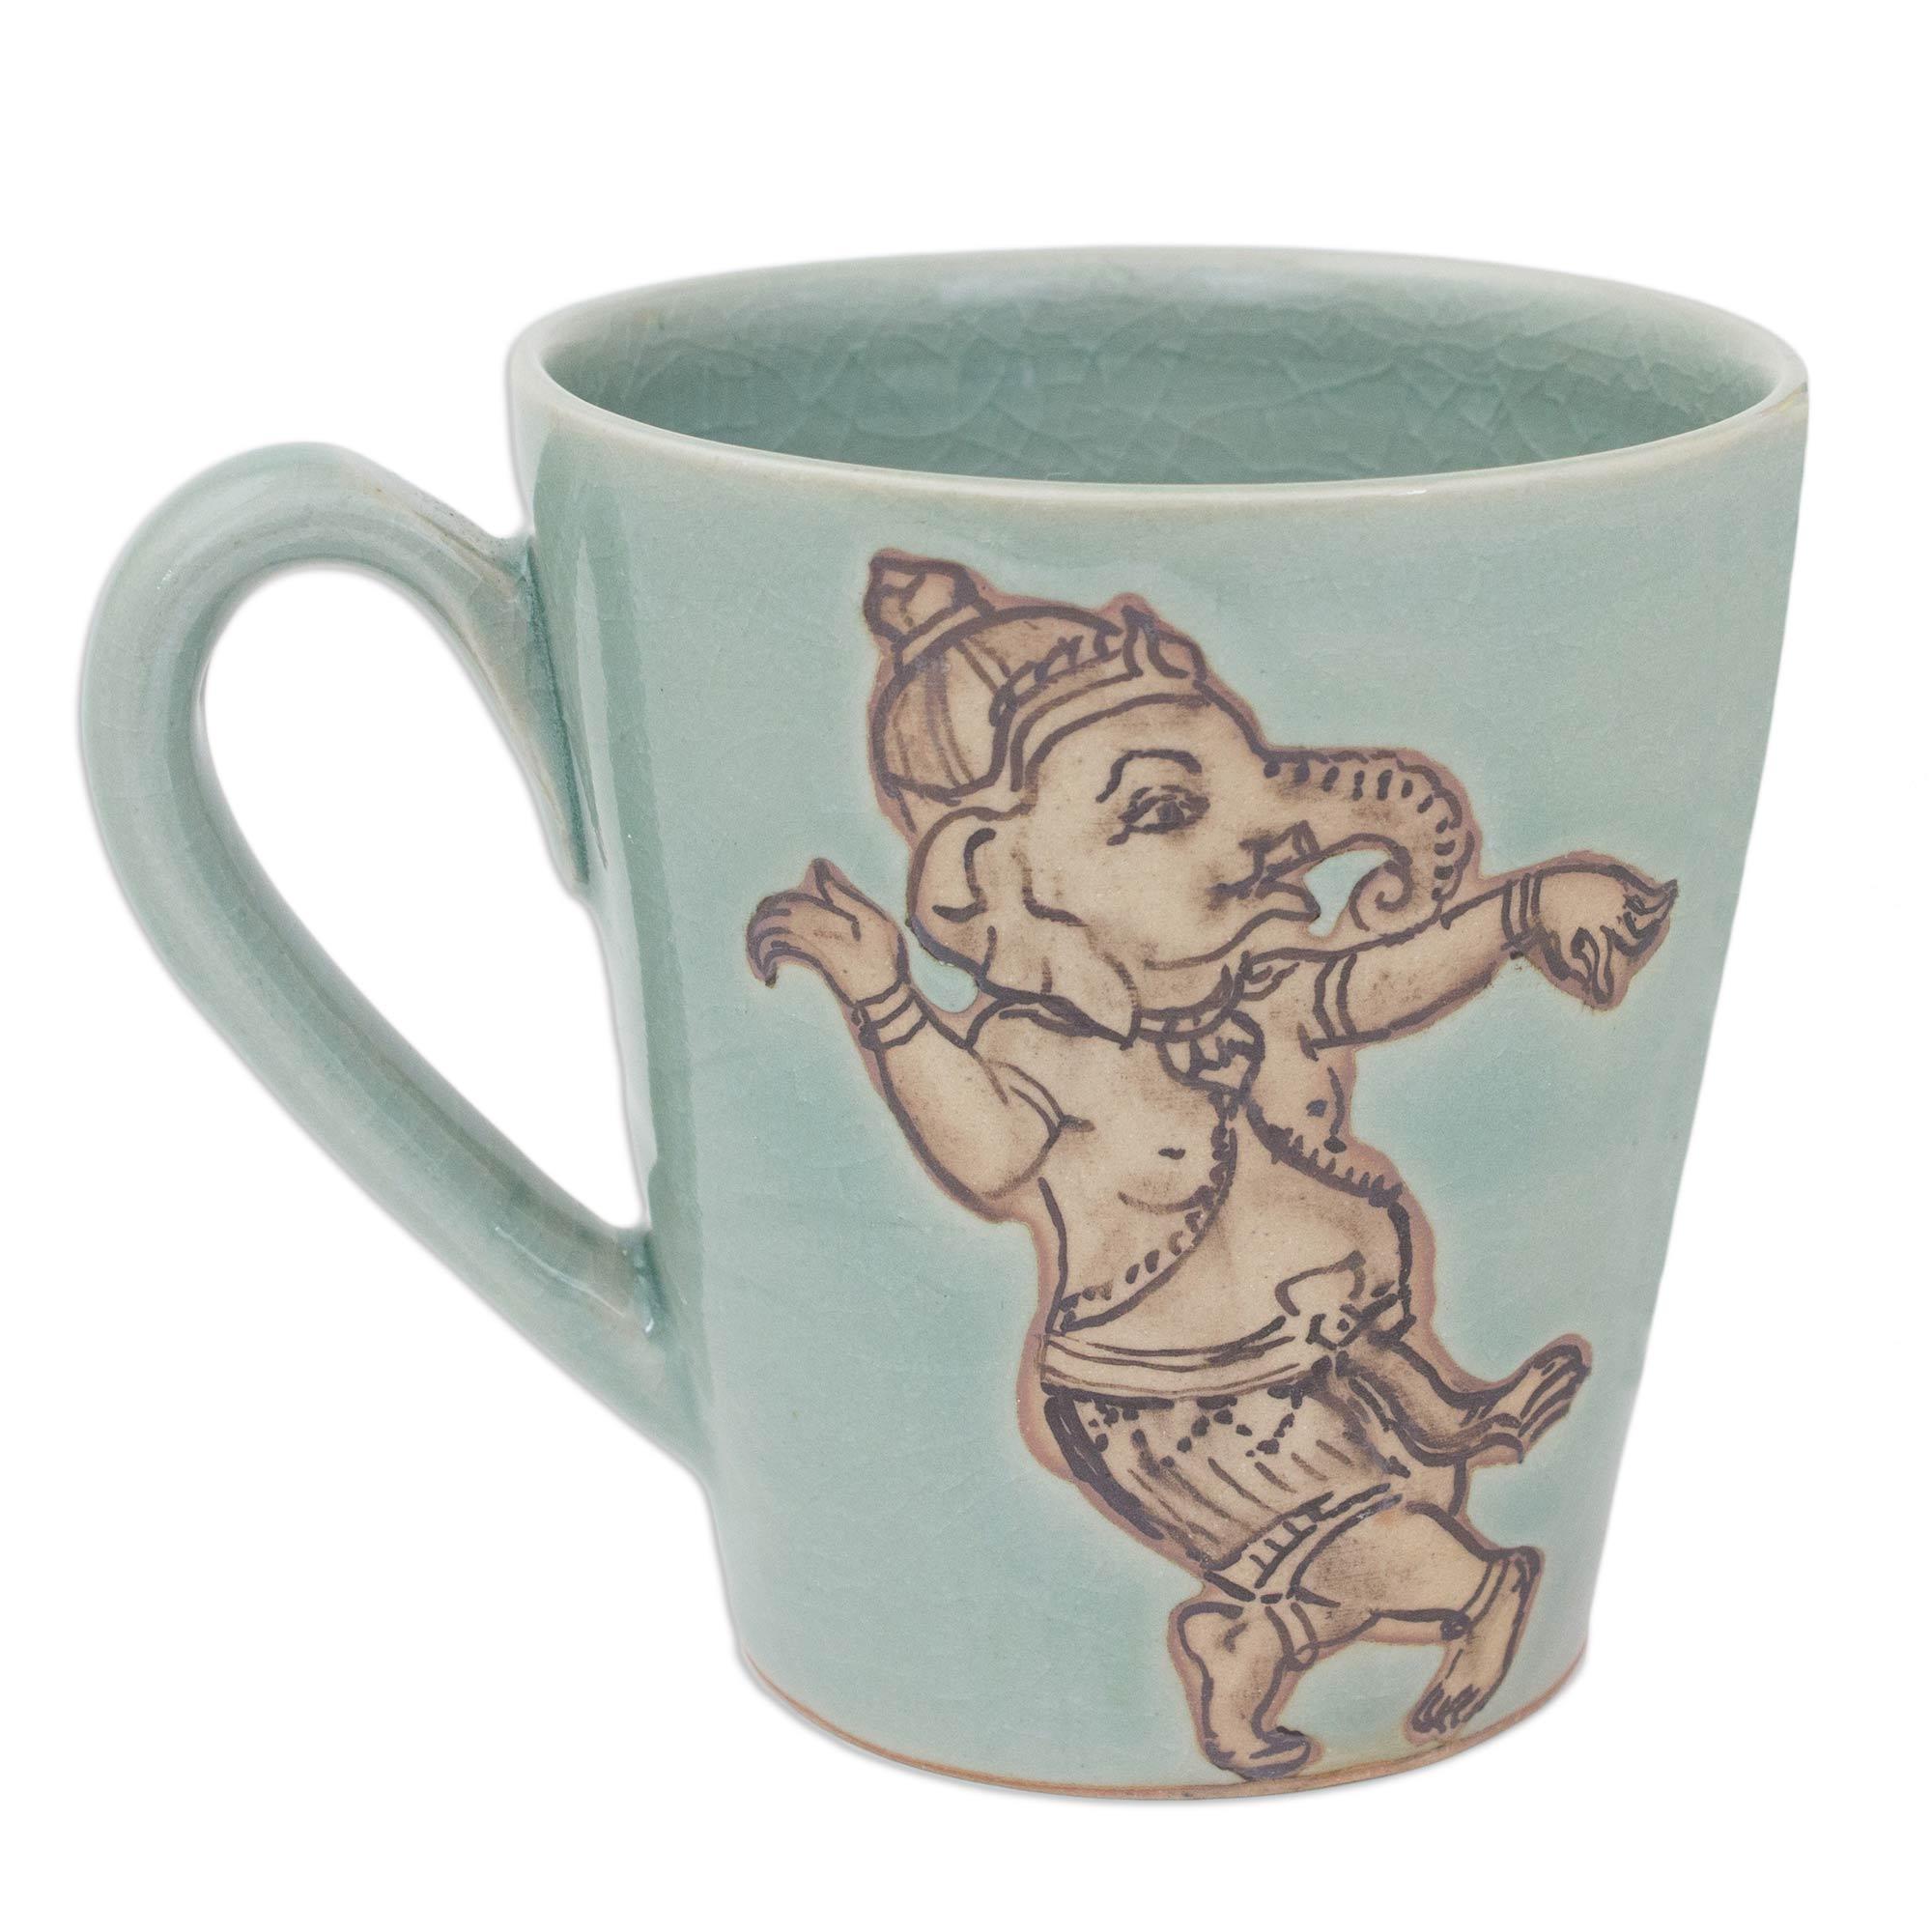 Whimsical Ganesha Light Blue Celadon Mug